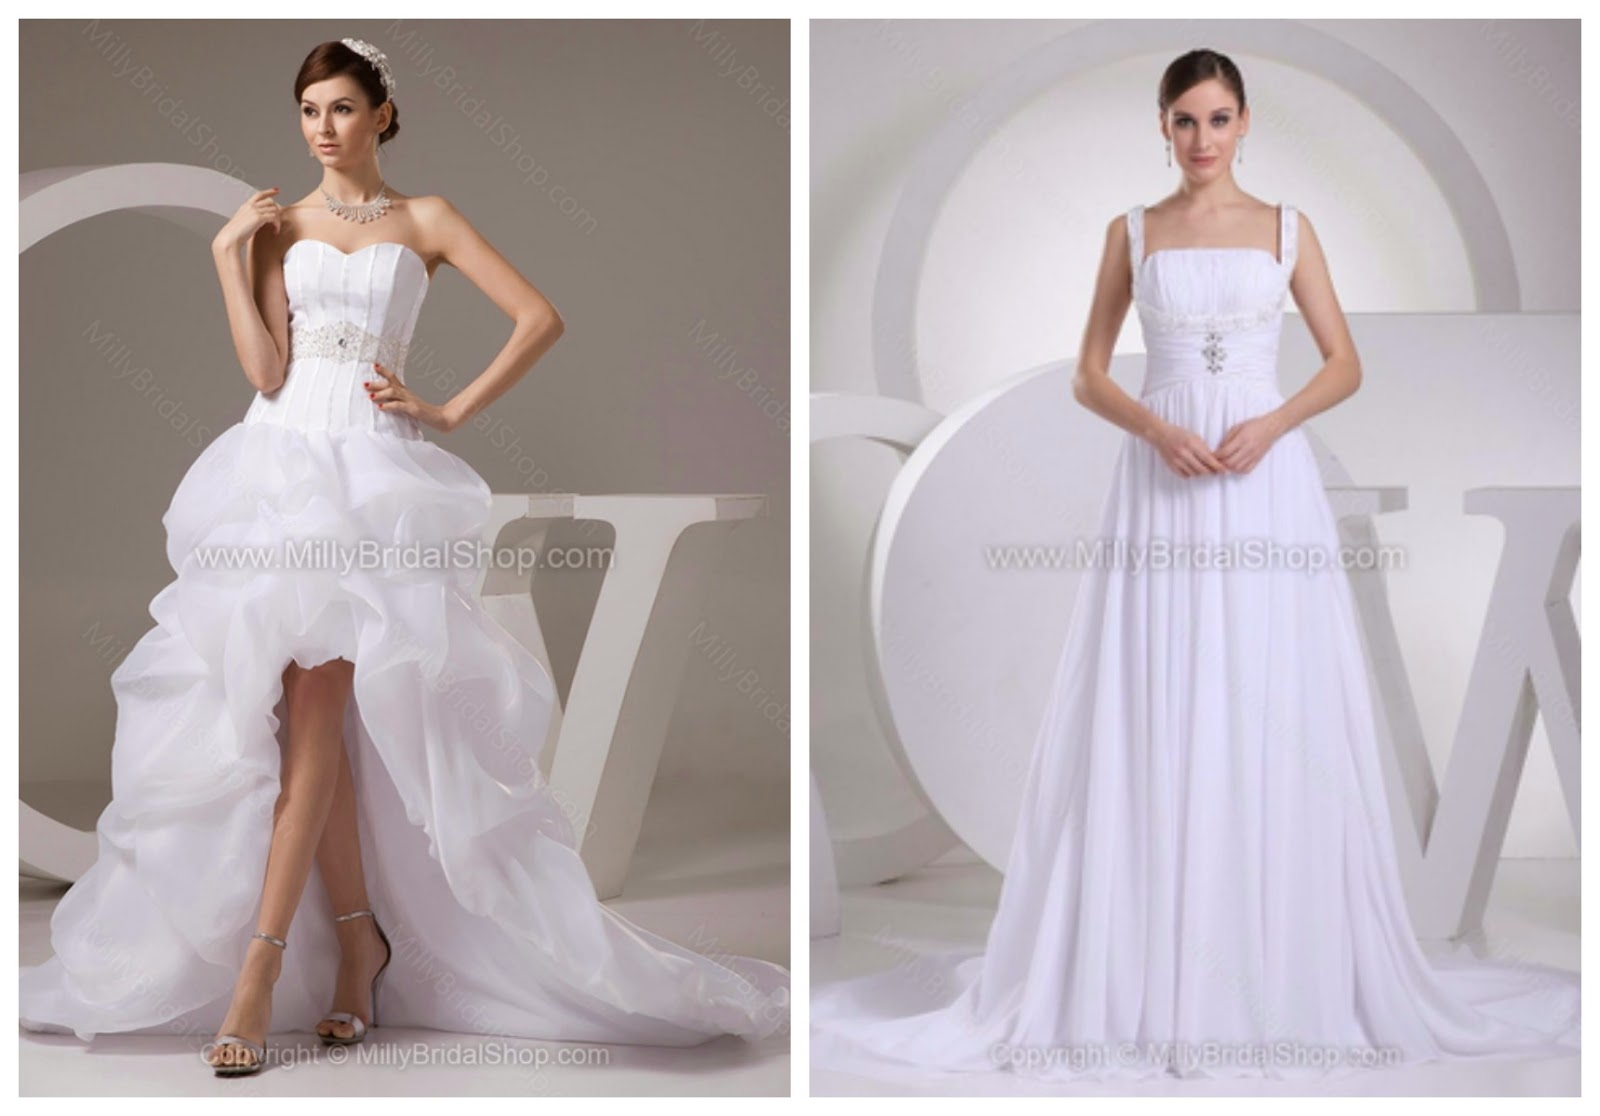 The Wedding Dress Shop 11 Inspirational I hope she turns